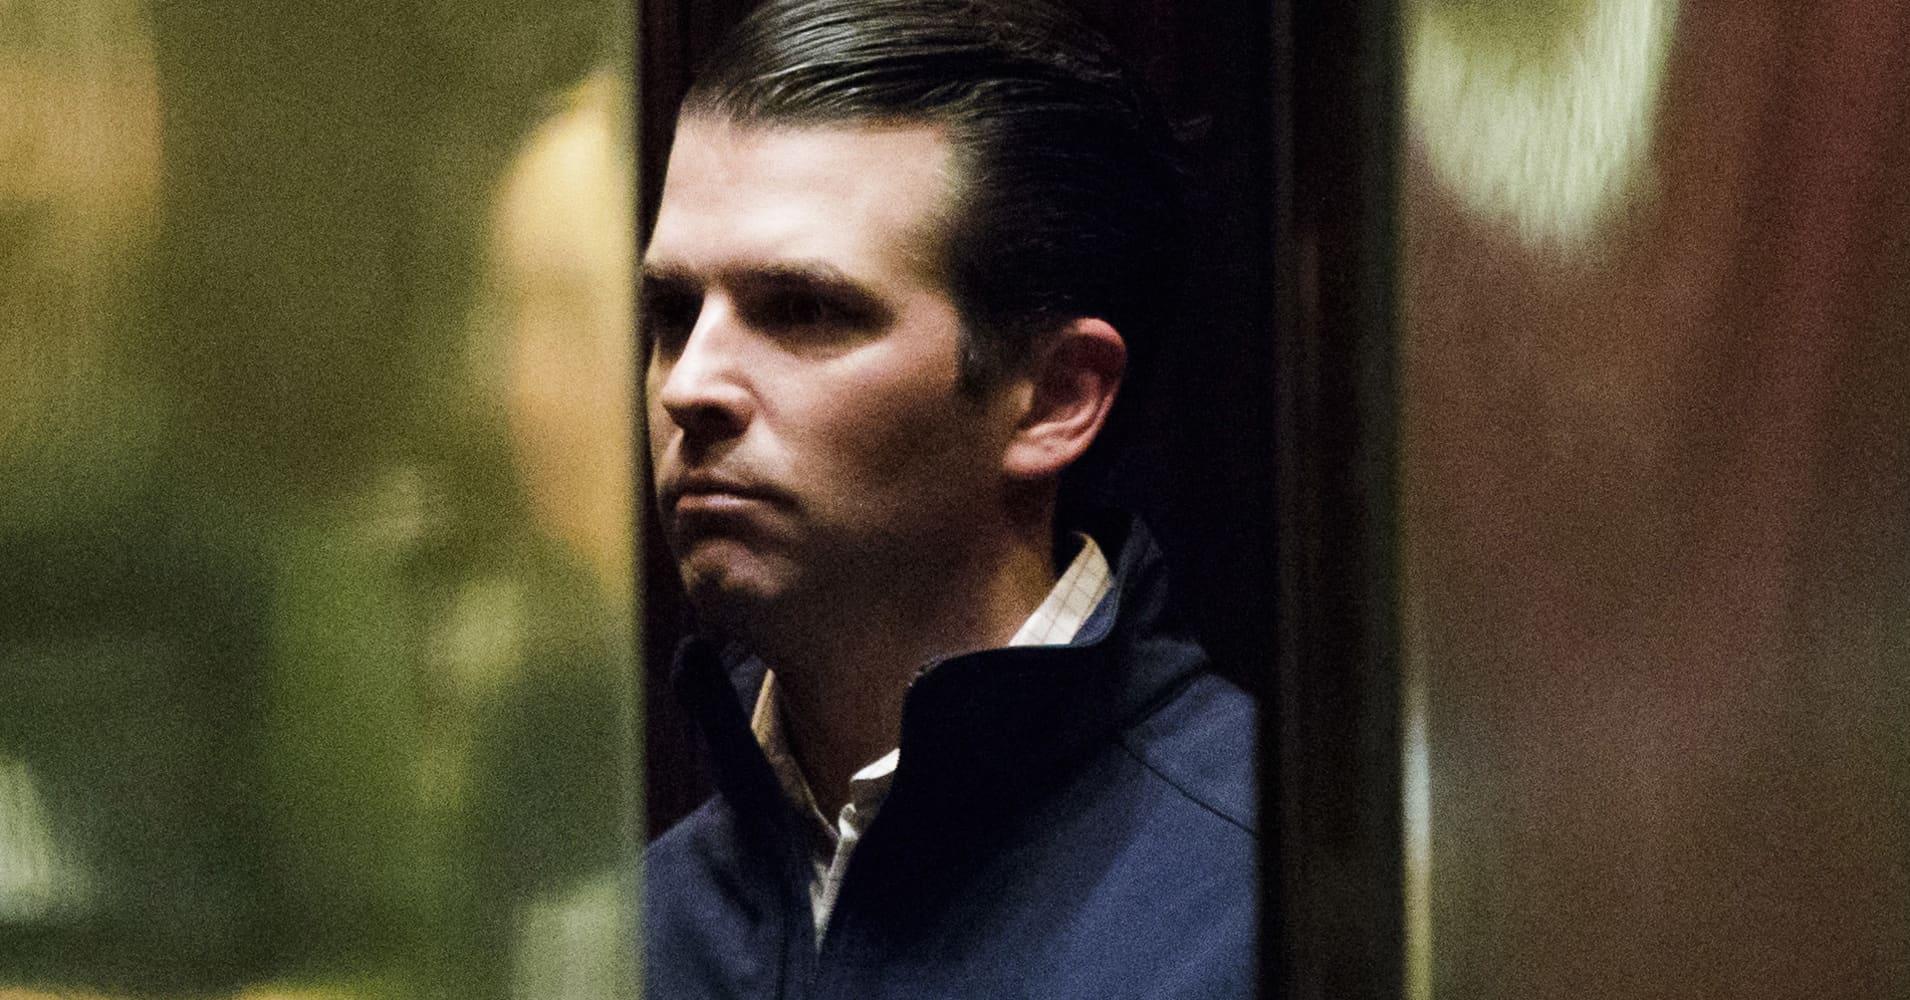 Senate Intelligence Committee subpoenas Donald Trump Jr.